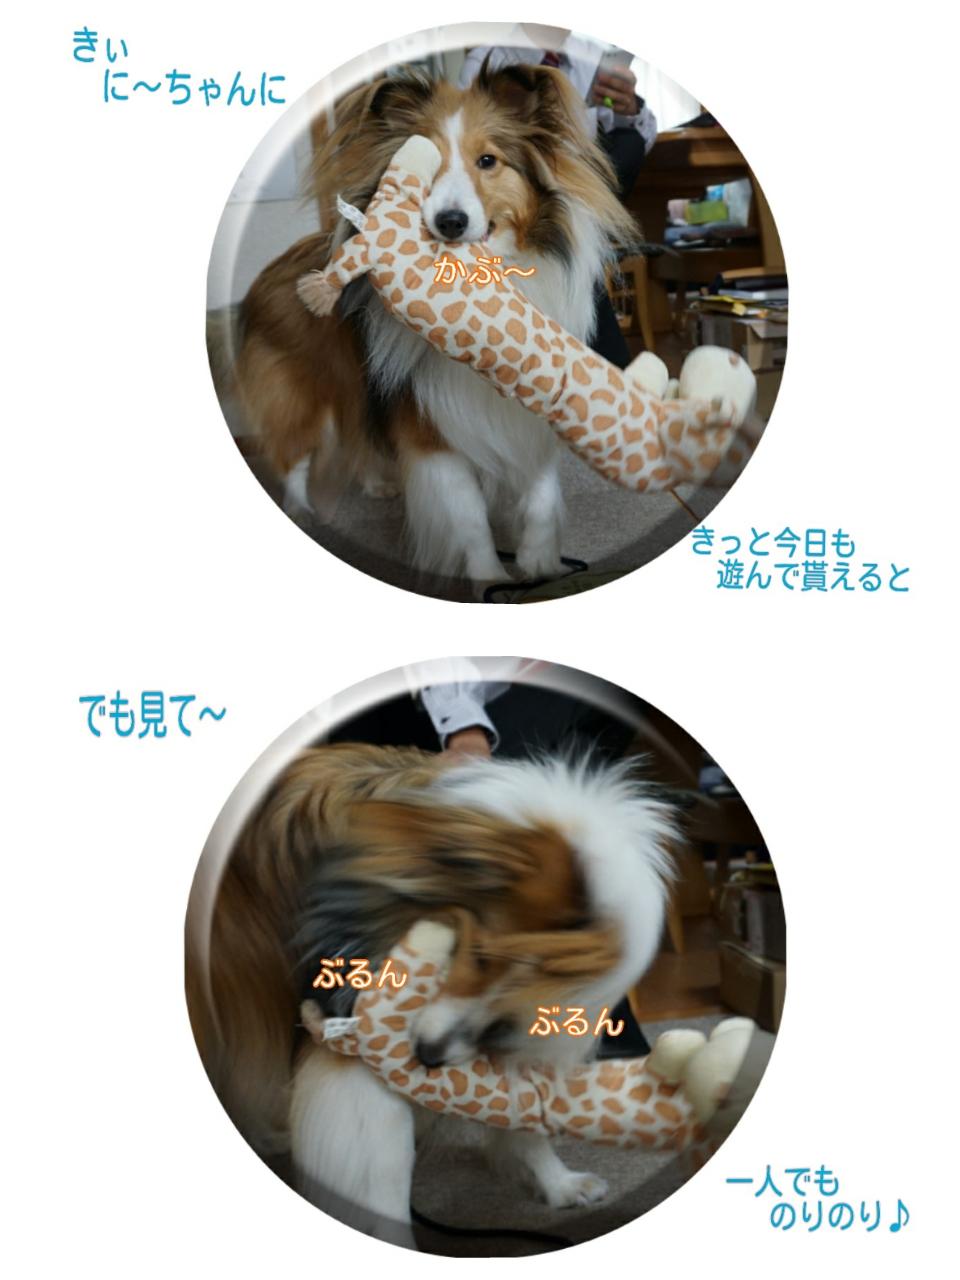 2015-04-01-10-49-24_deco.jpg